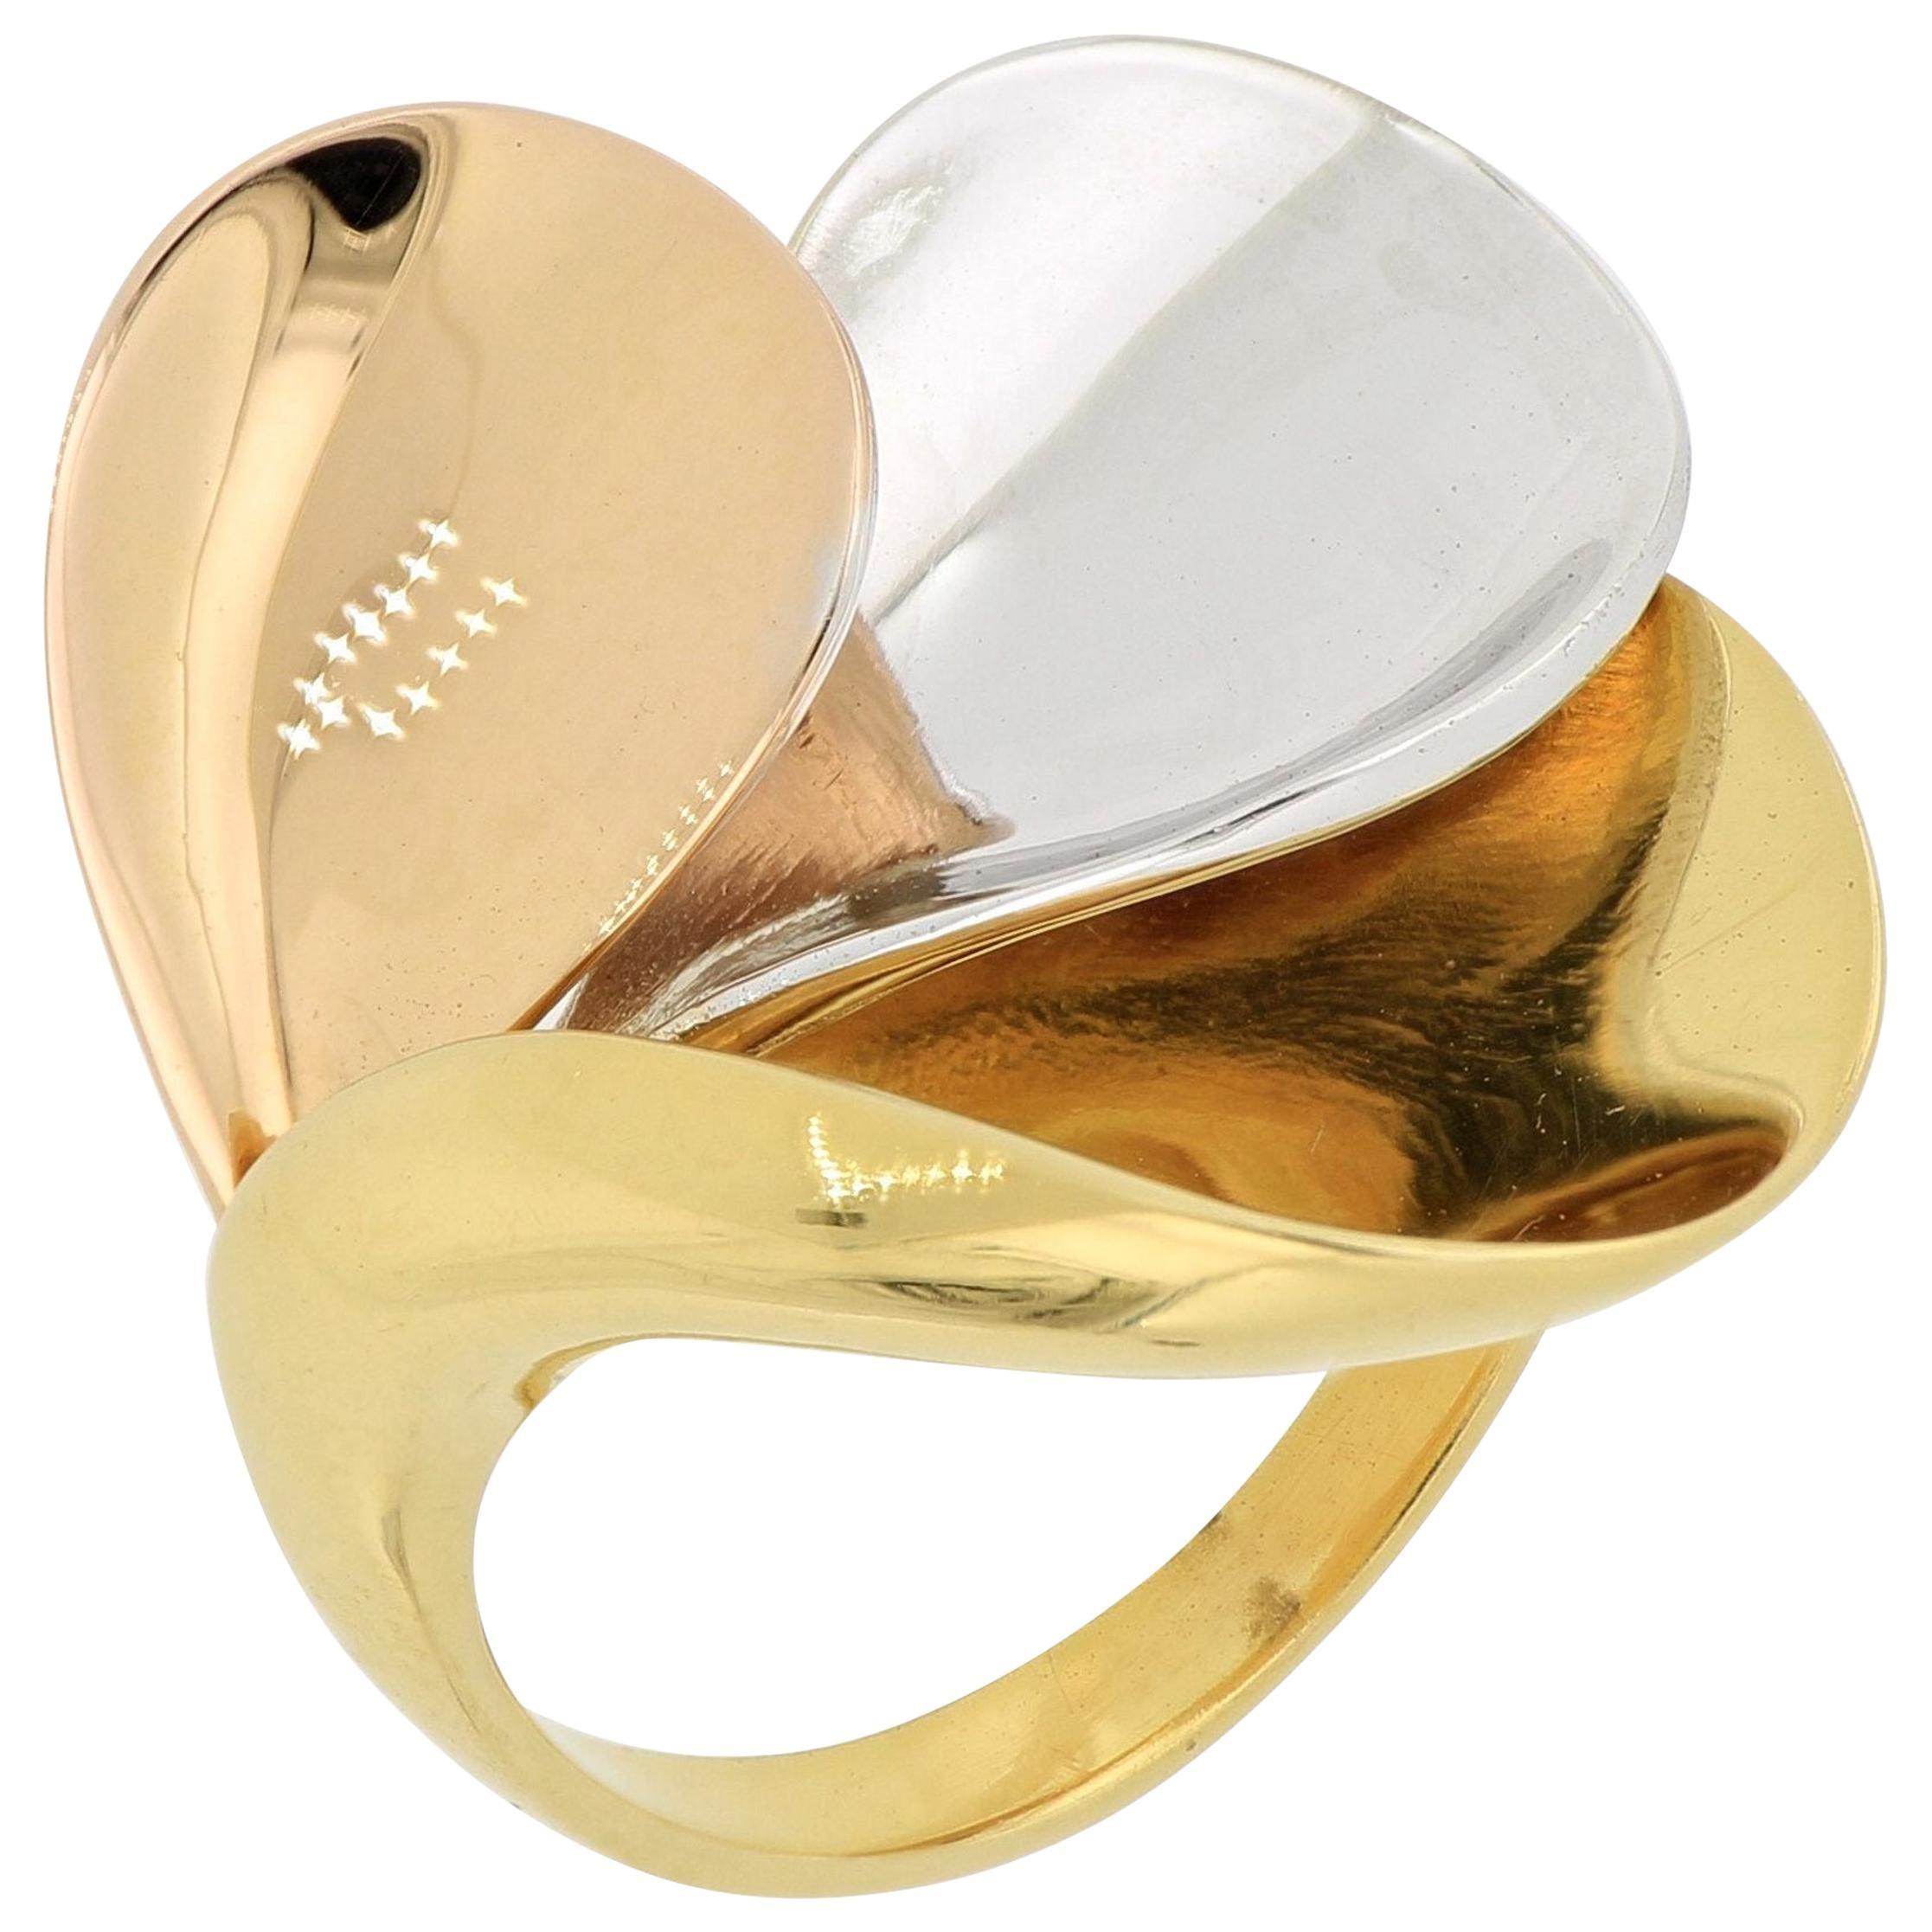 18 Karat Gold Tricolor Ring